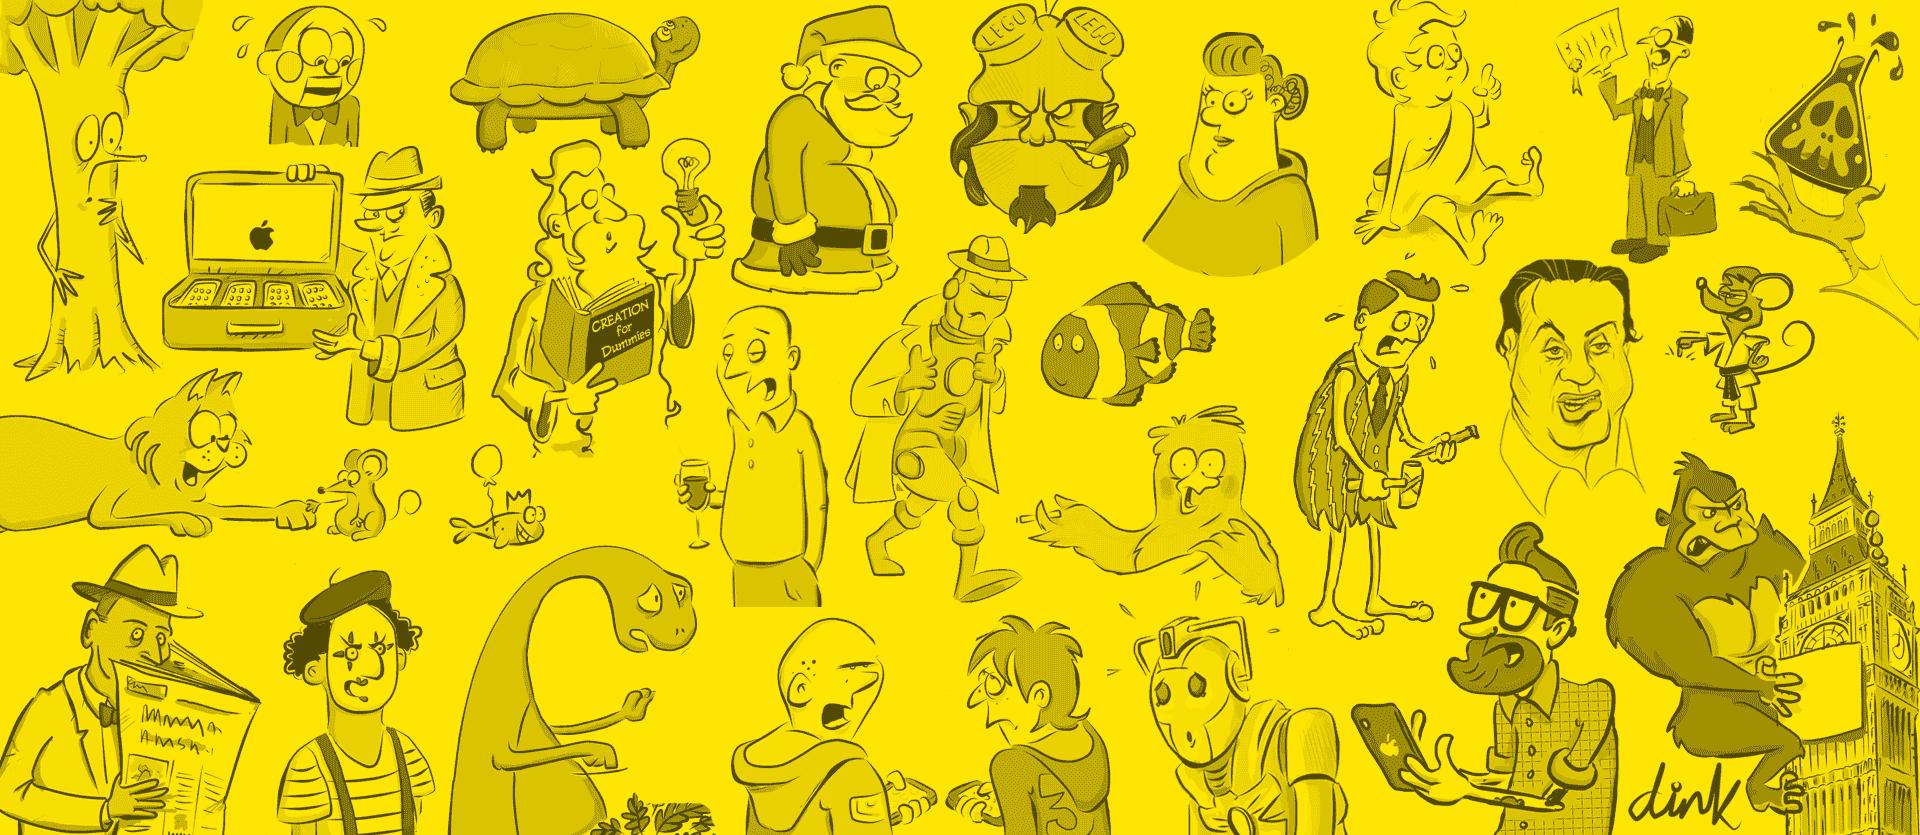 Dink Cartoons